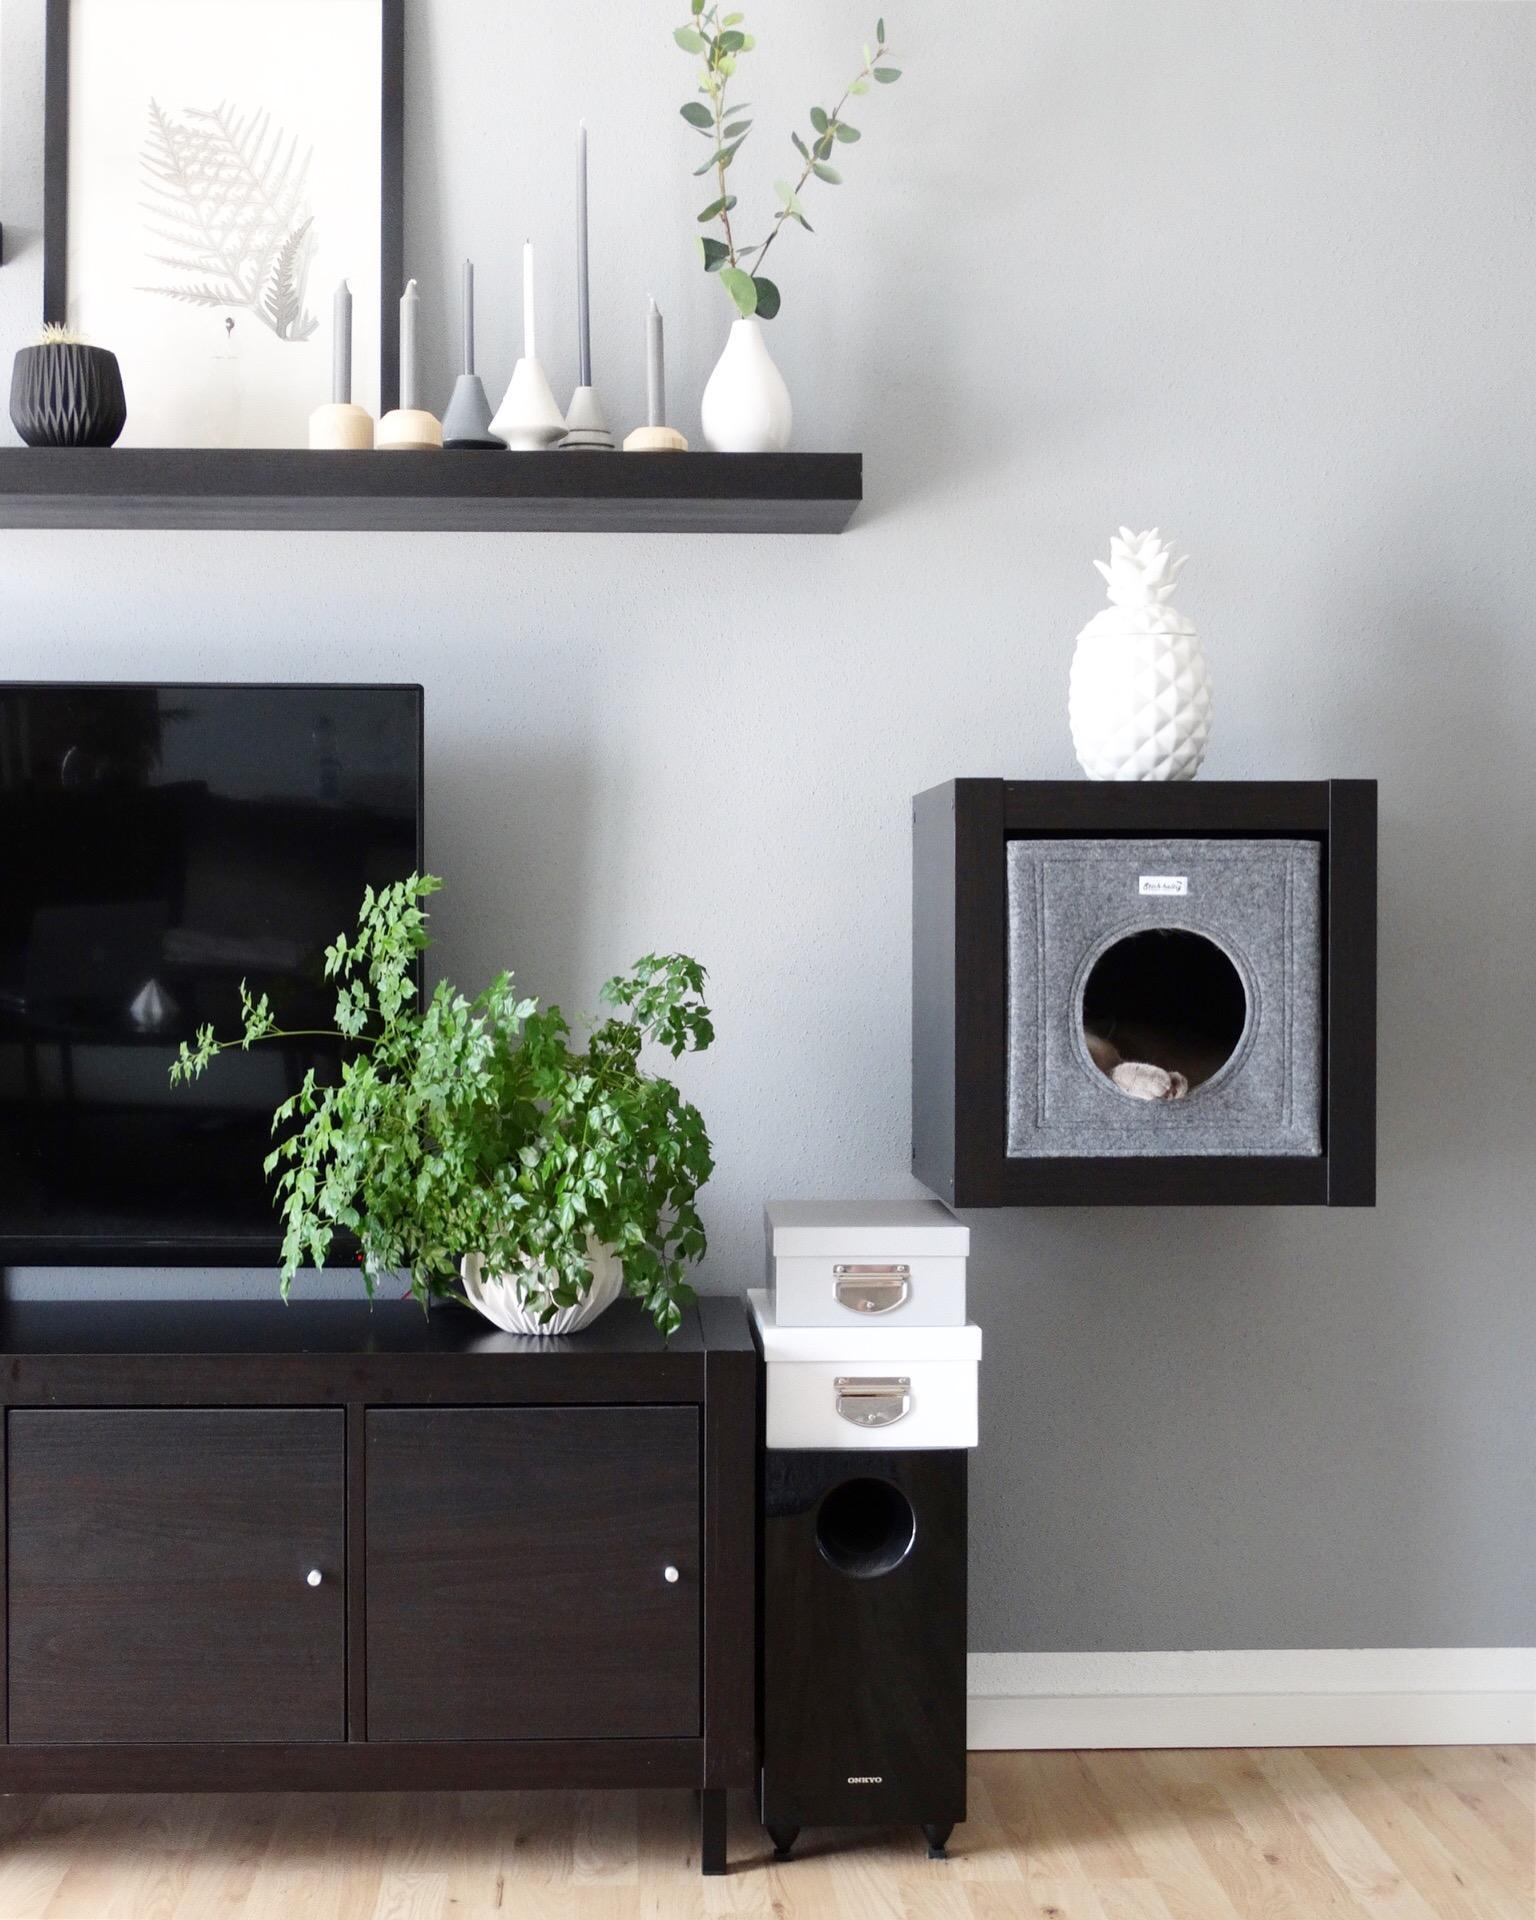 Ikea kallax bilder ideen couchstyle for Kallax ideen